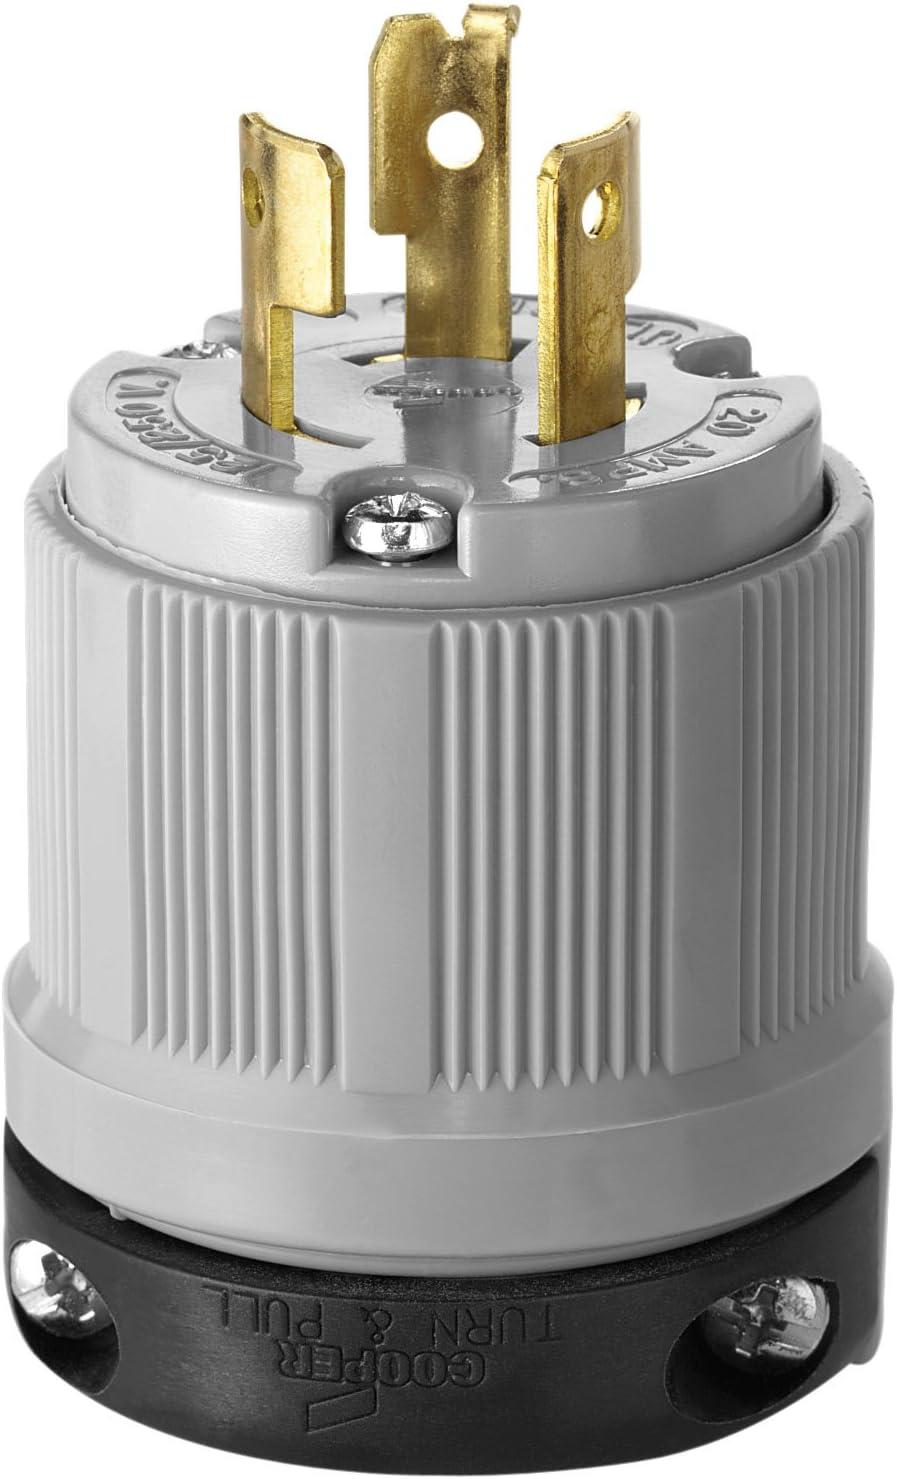 Eaton 5745N 50 Amp 125//250V 14-50 Industrial Power Plug Gray